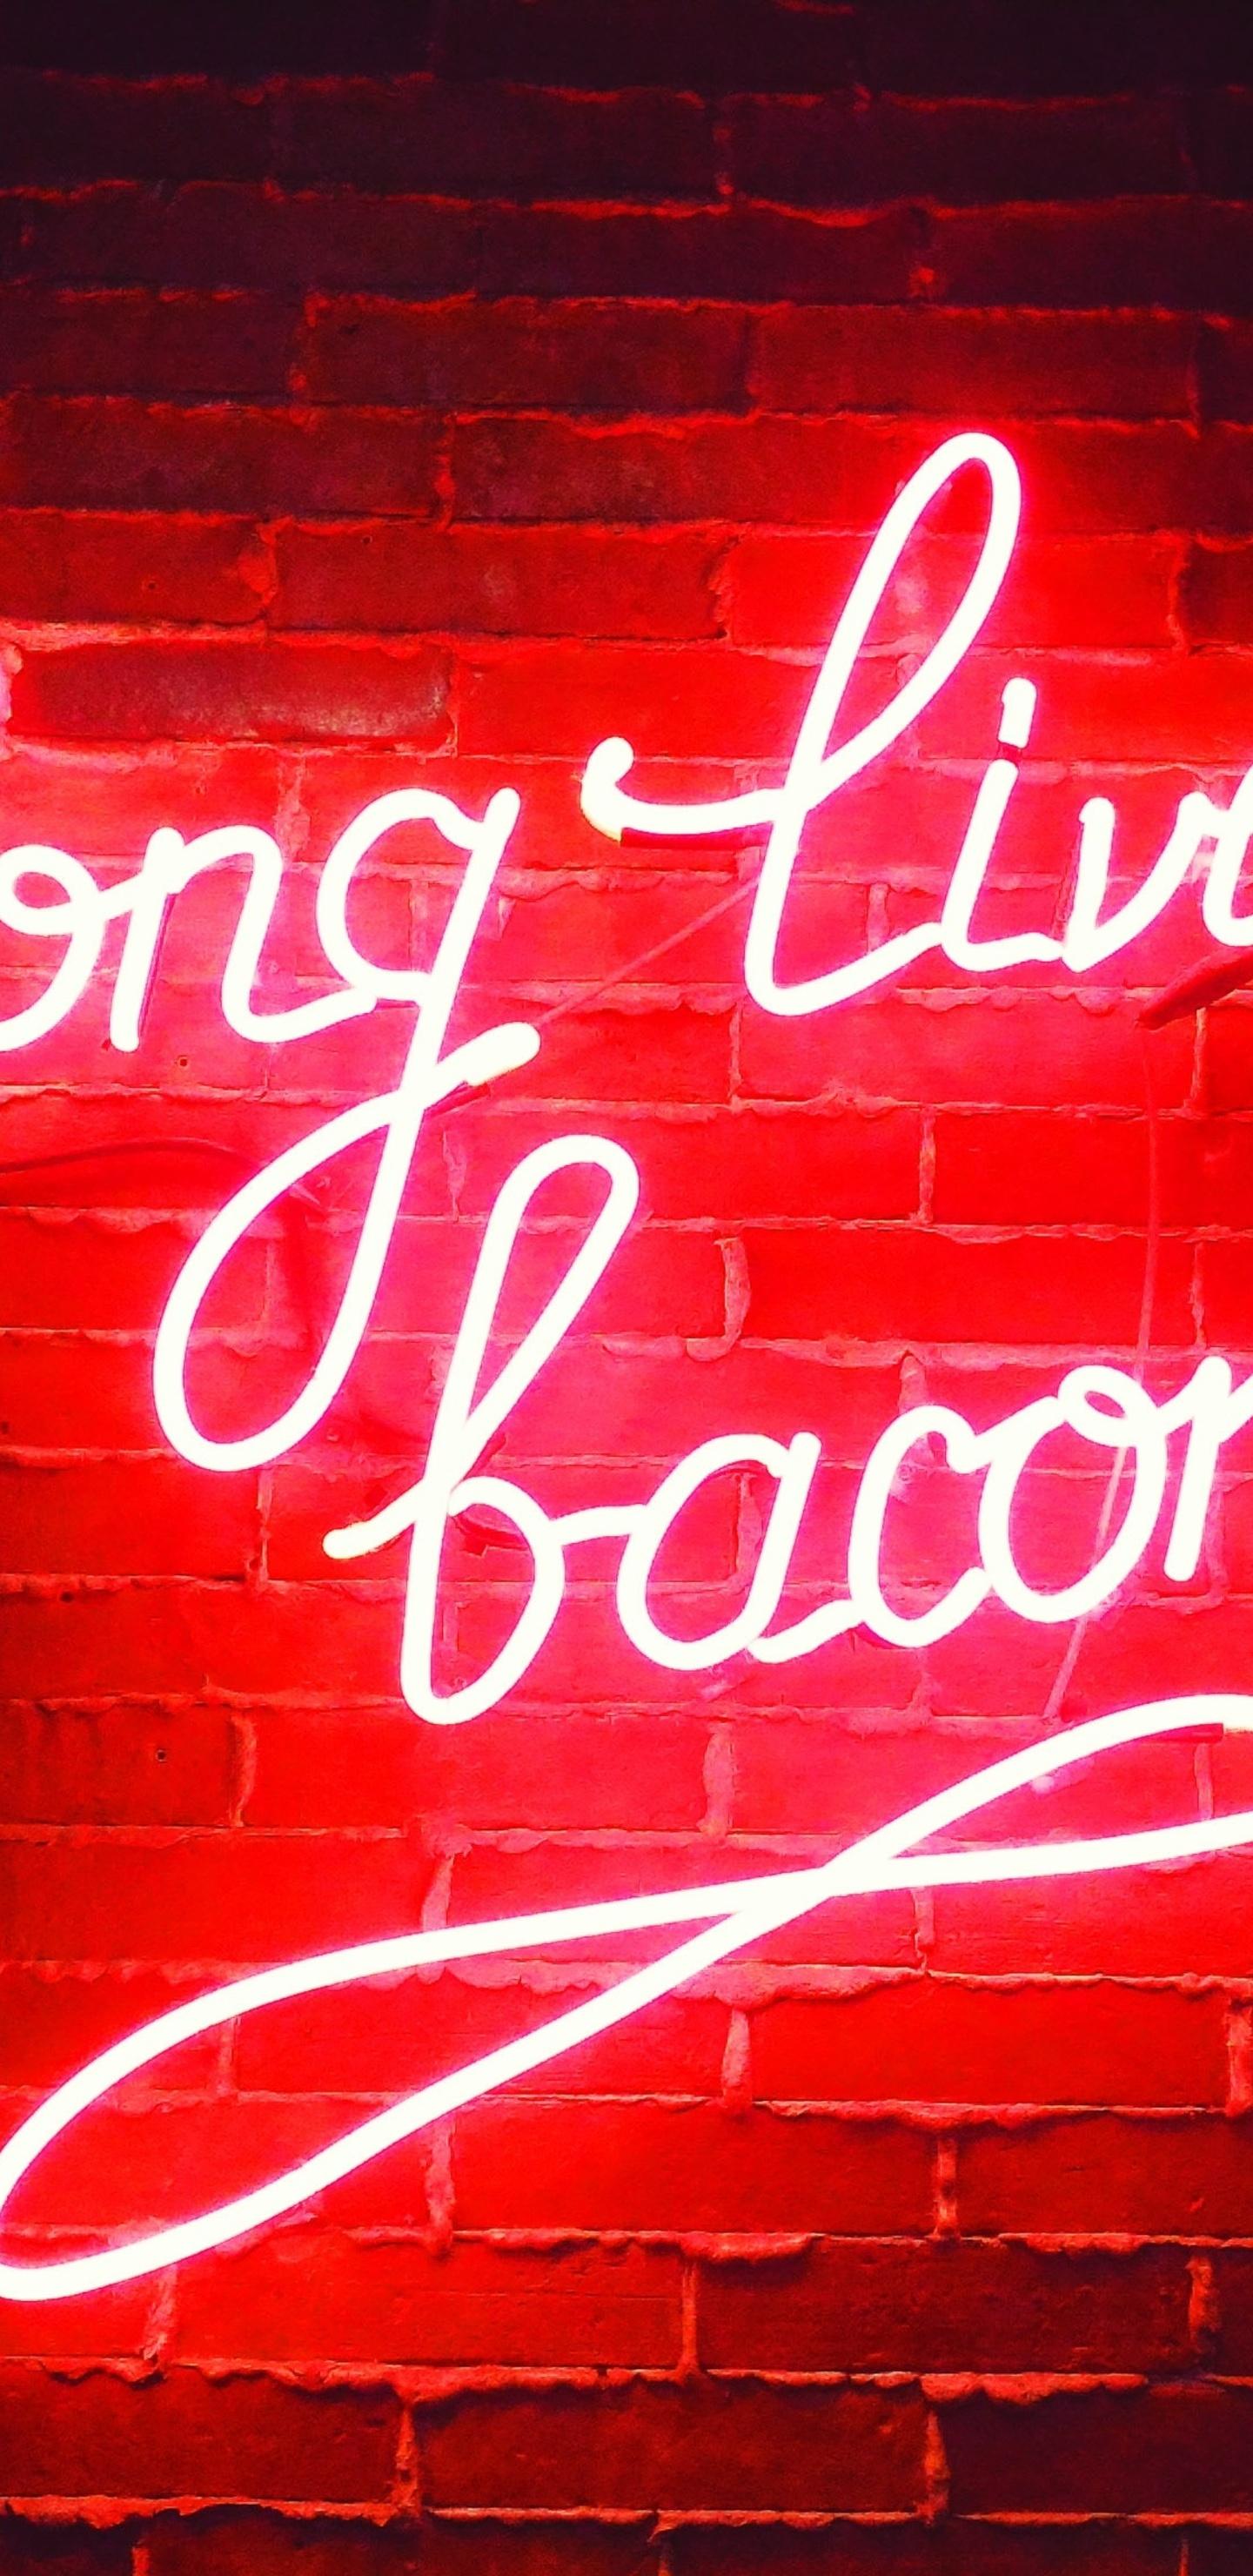 long-live-bacon-neon-lights-s9.jpg